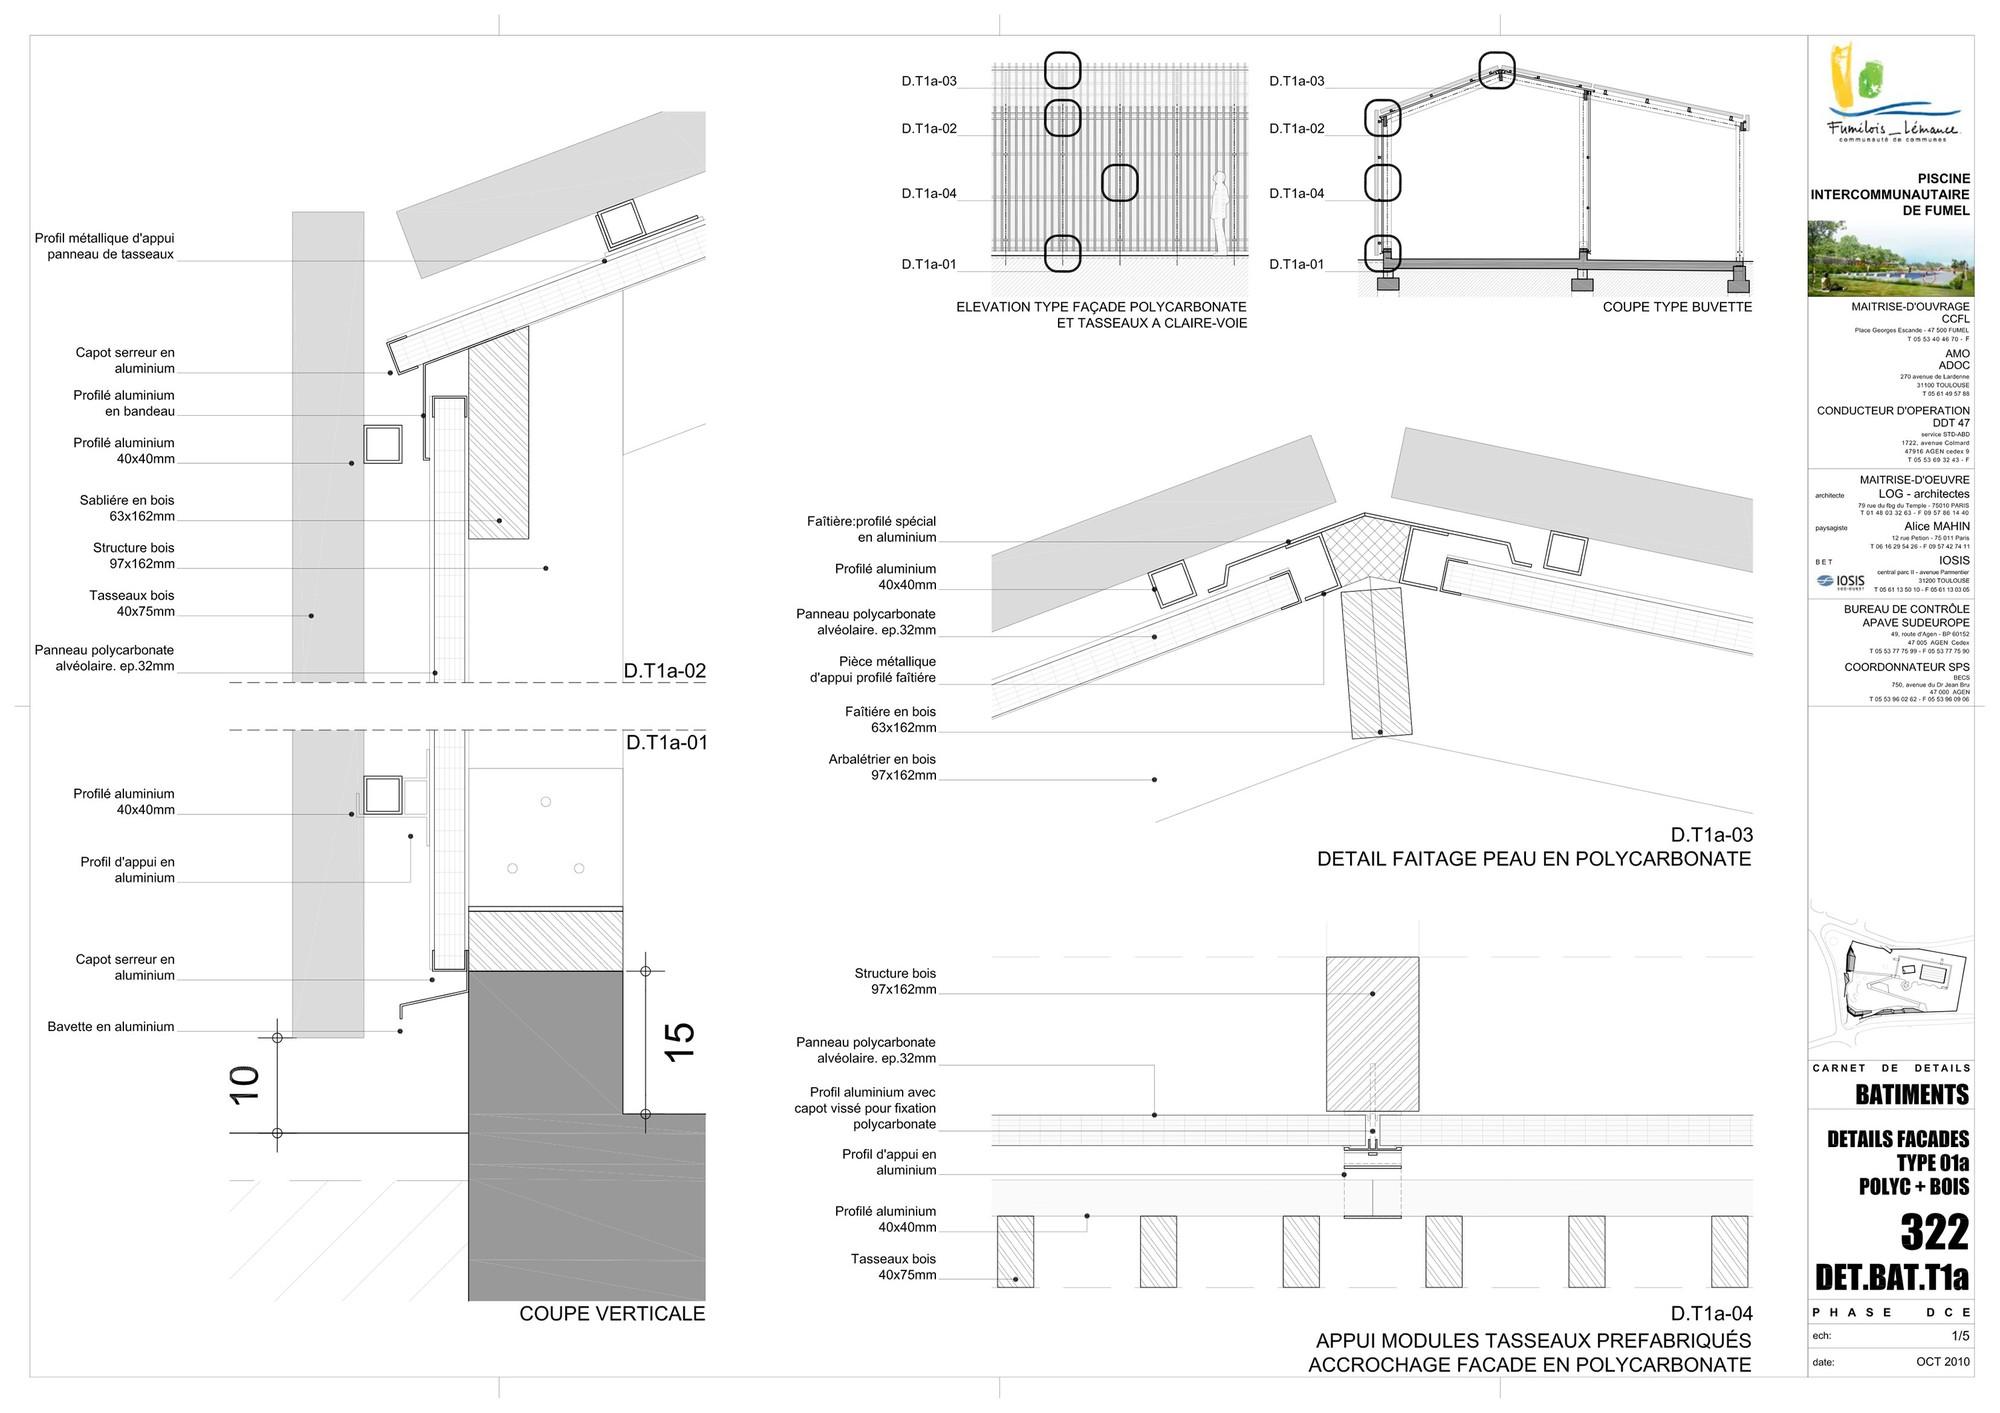 gallery of th tre d 39 eau swimming pool log architectes 36. Black Bedroom Furniture Sets. Home Design Ideas